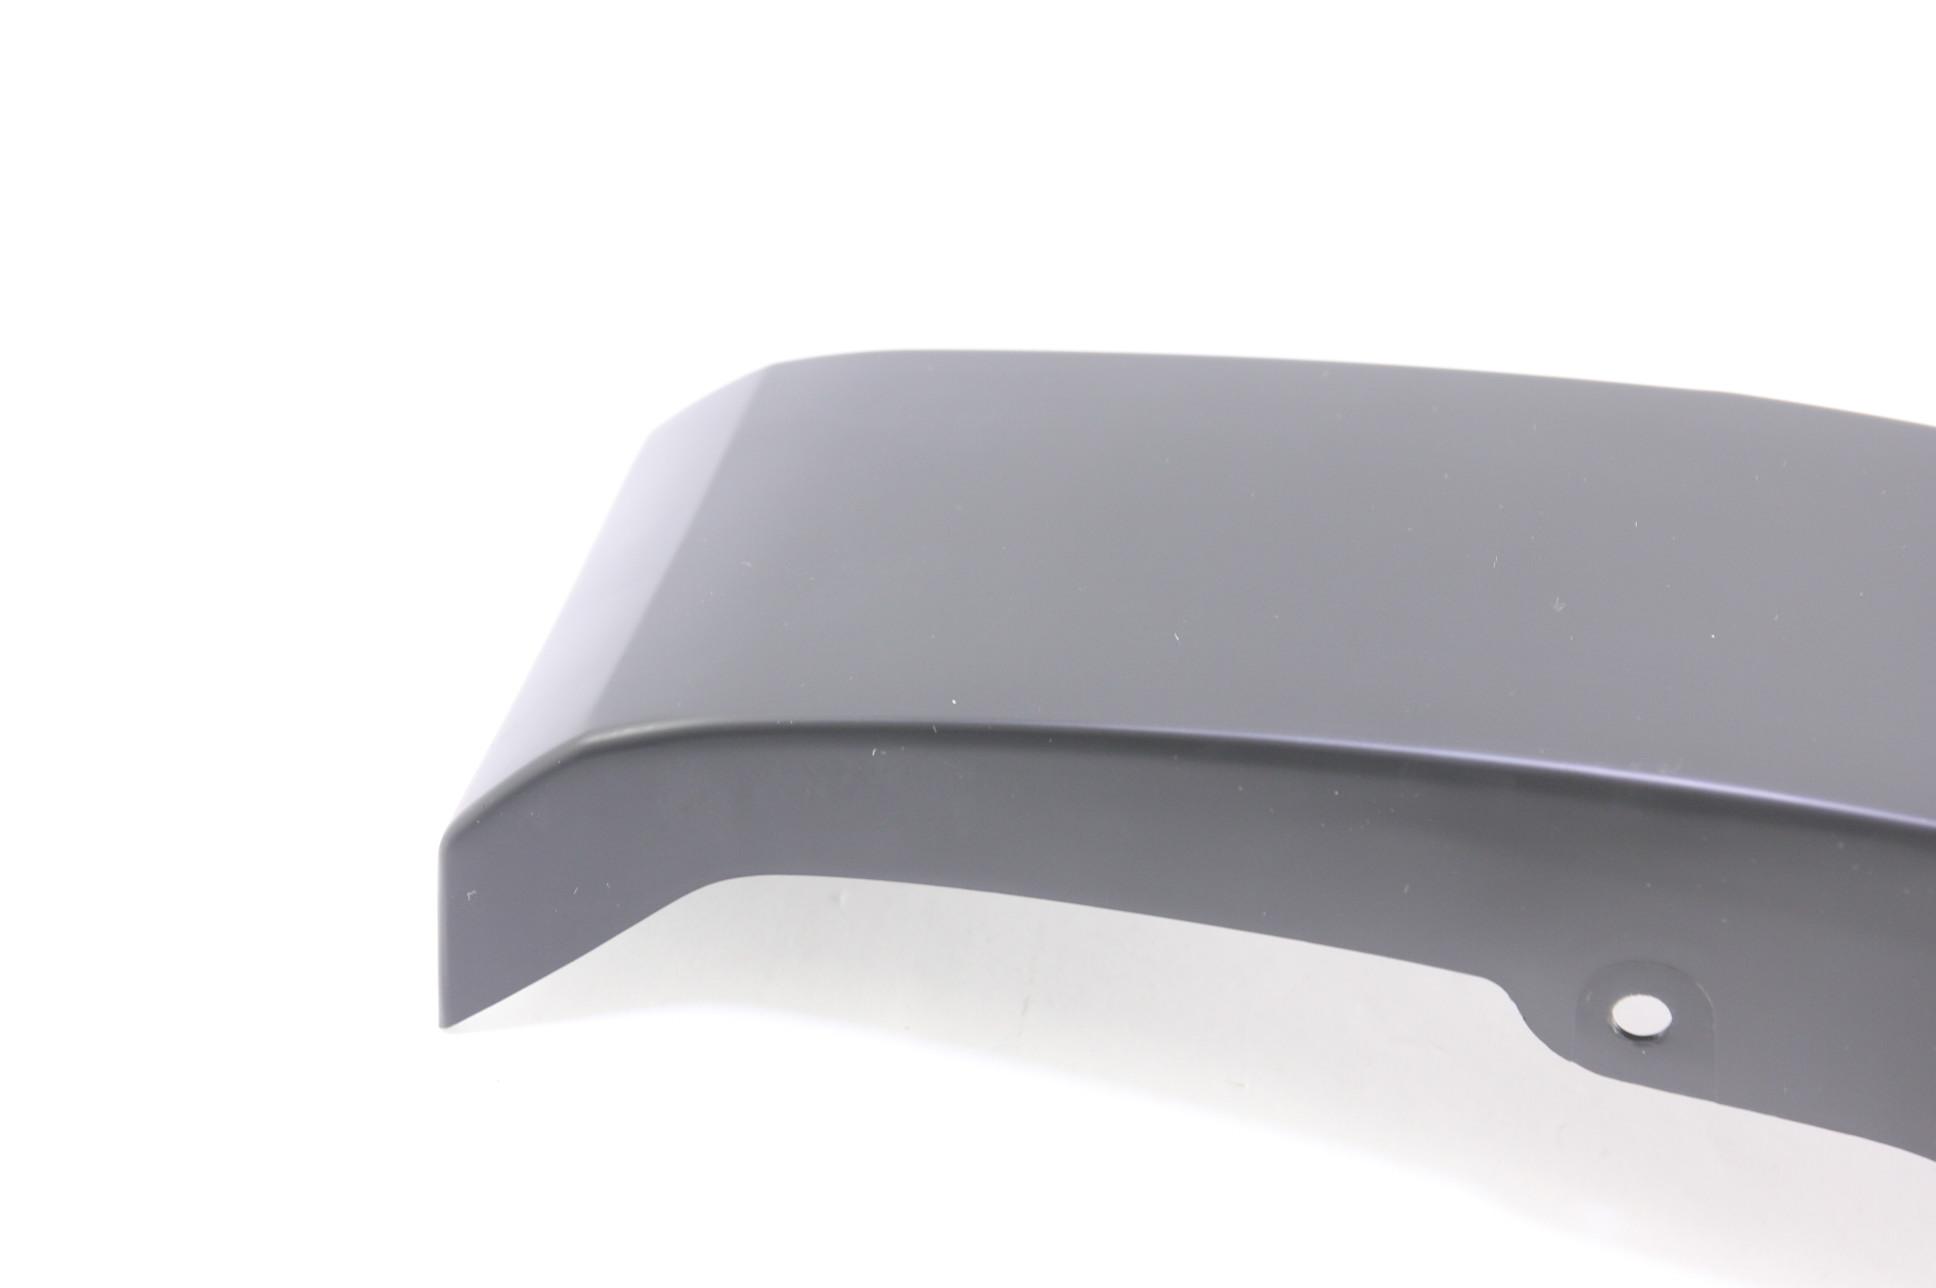 *~ New OEM Hyundai 8771126500 Front LH Exterior Fender Moulding 05-06 Santa Fe - image 4